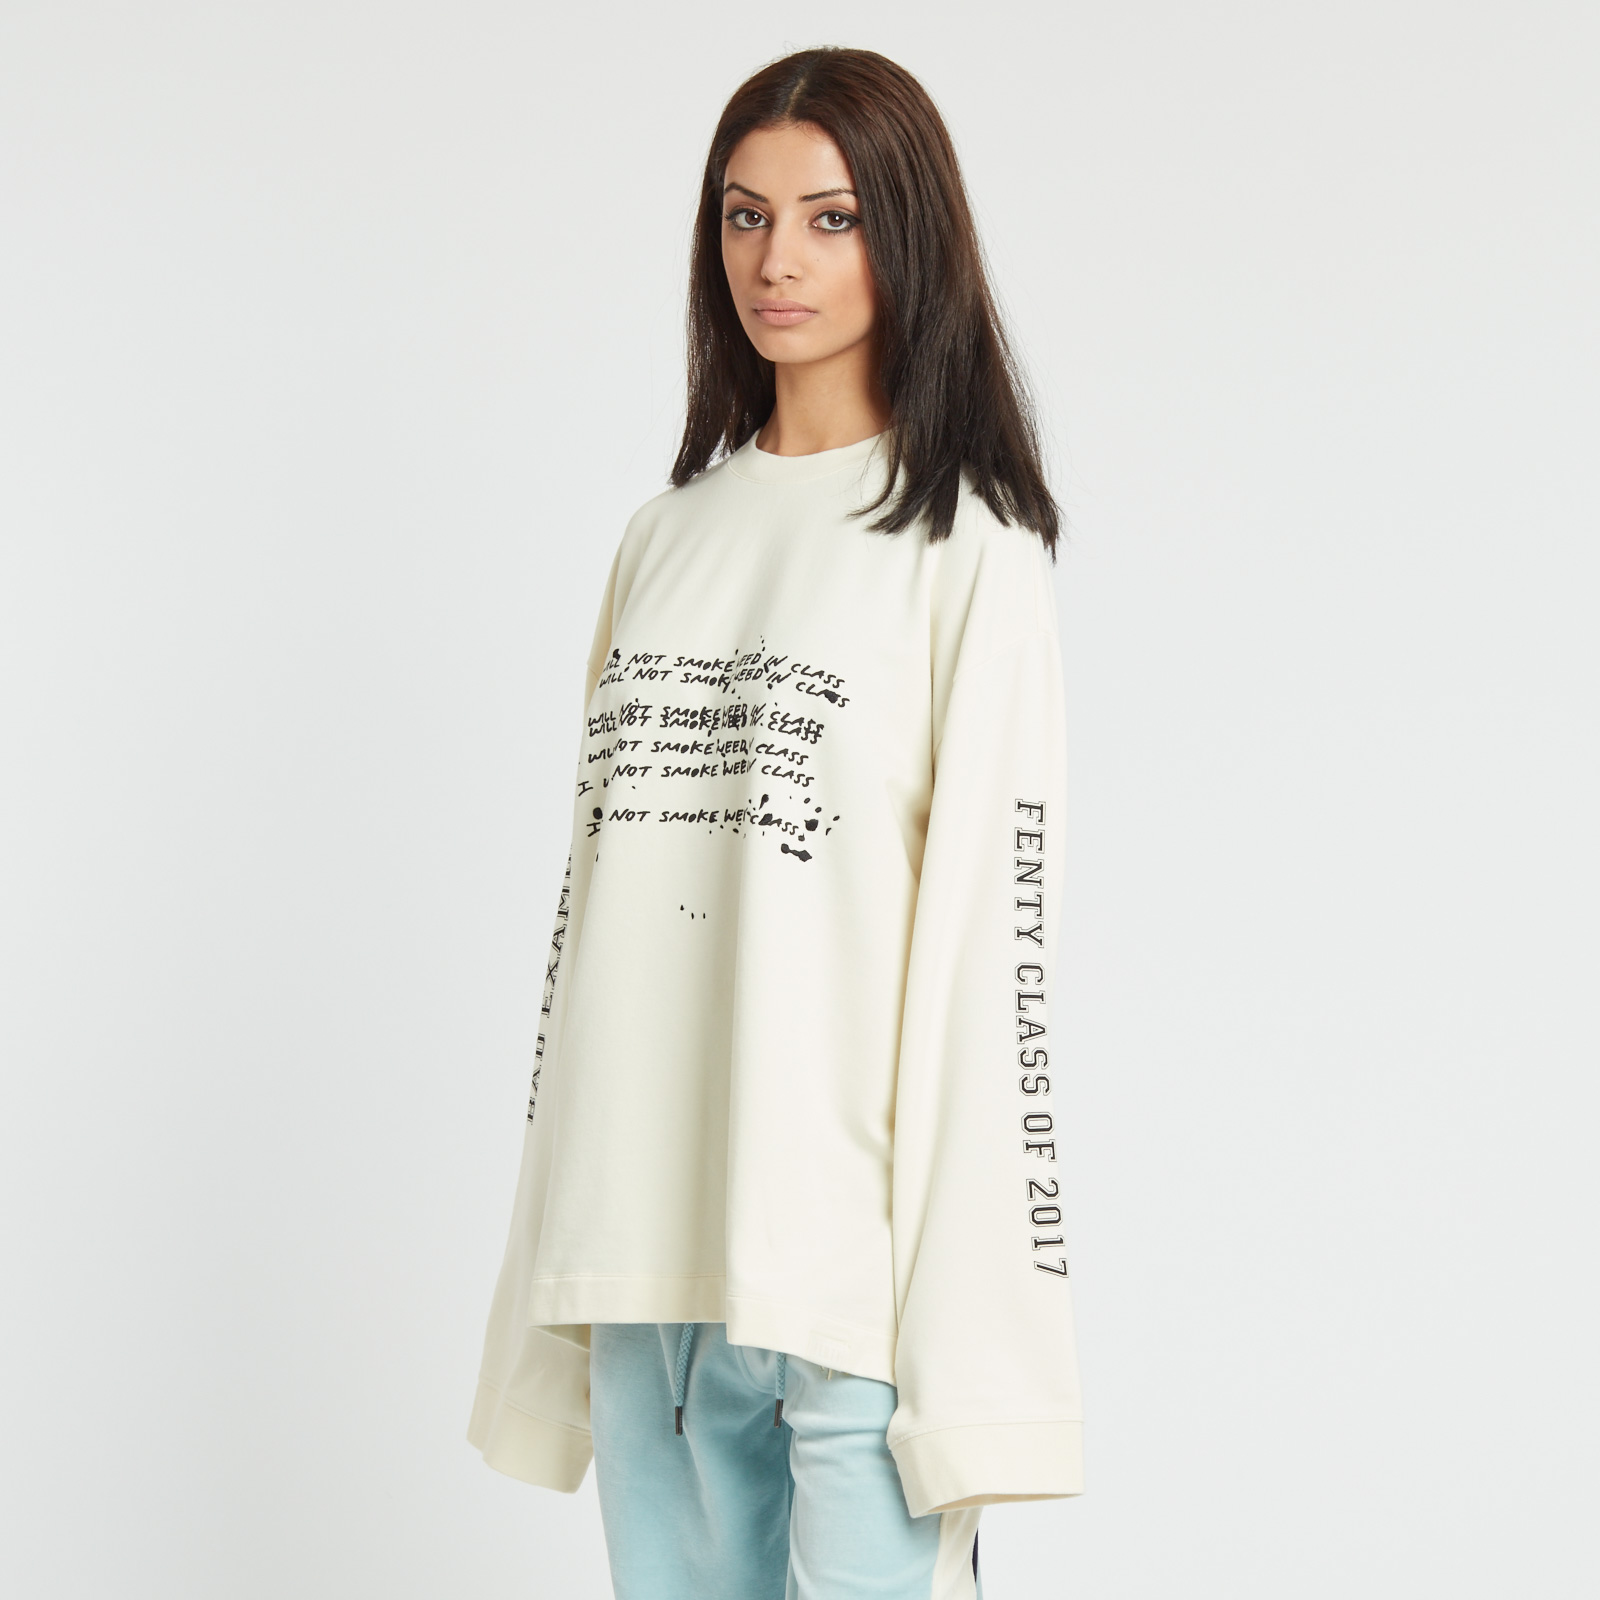 0083b049a62f Puma LS Graphic Crew Neck T-Shirt - 575871-02 - Sneakersnstuff ...